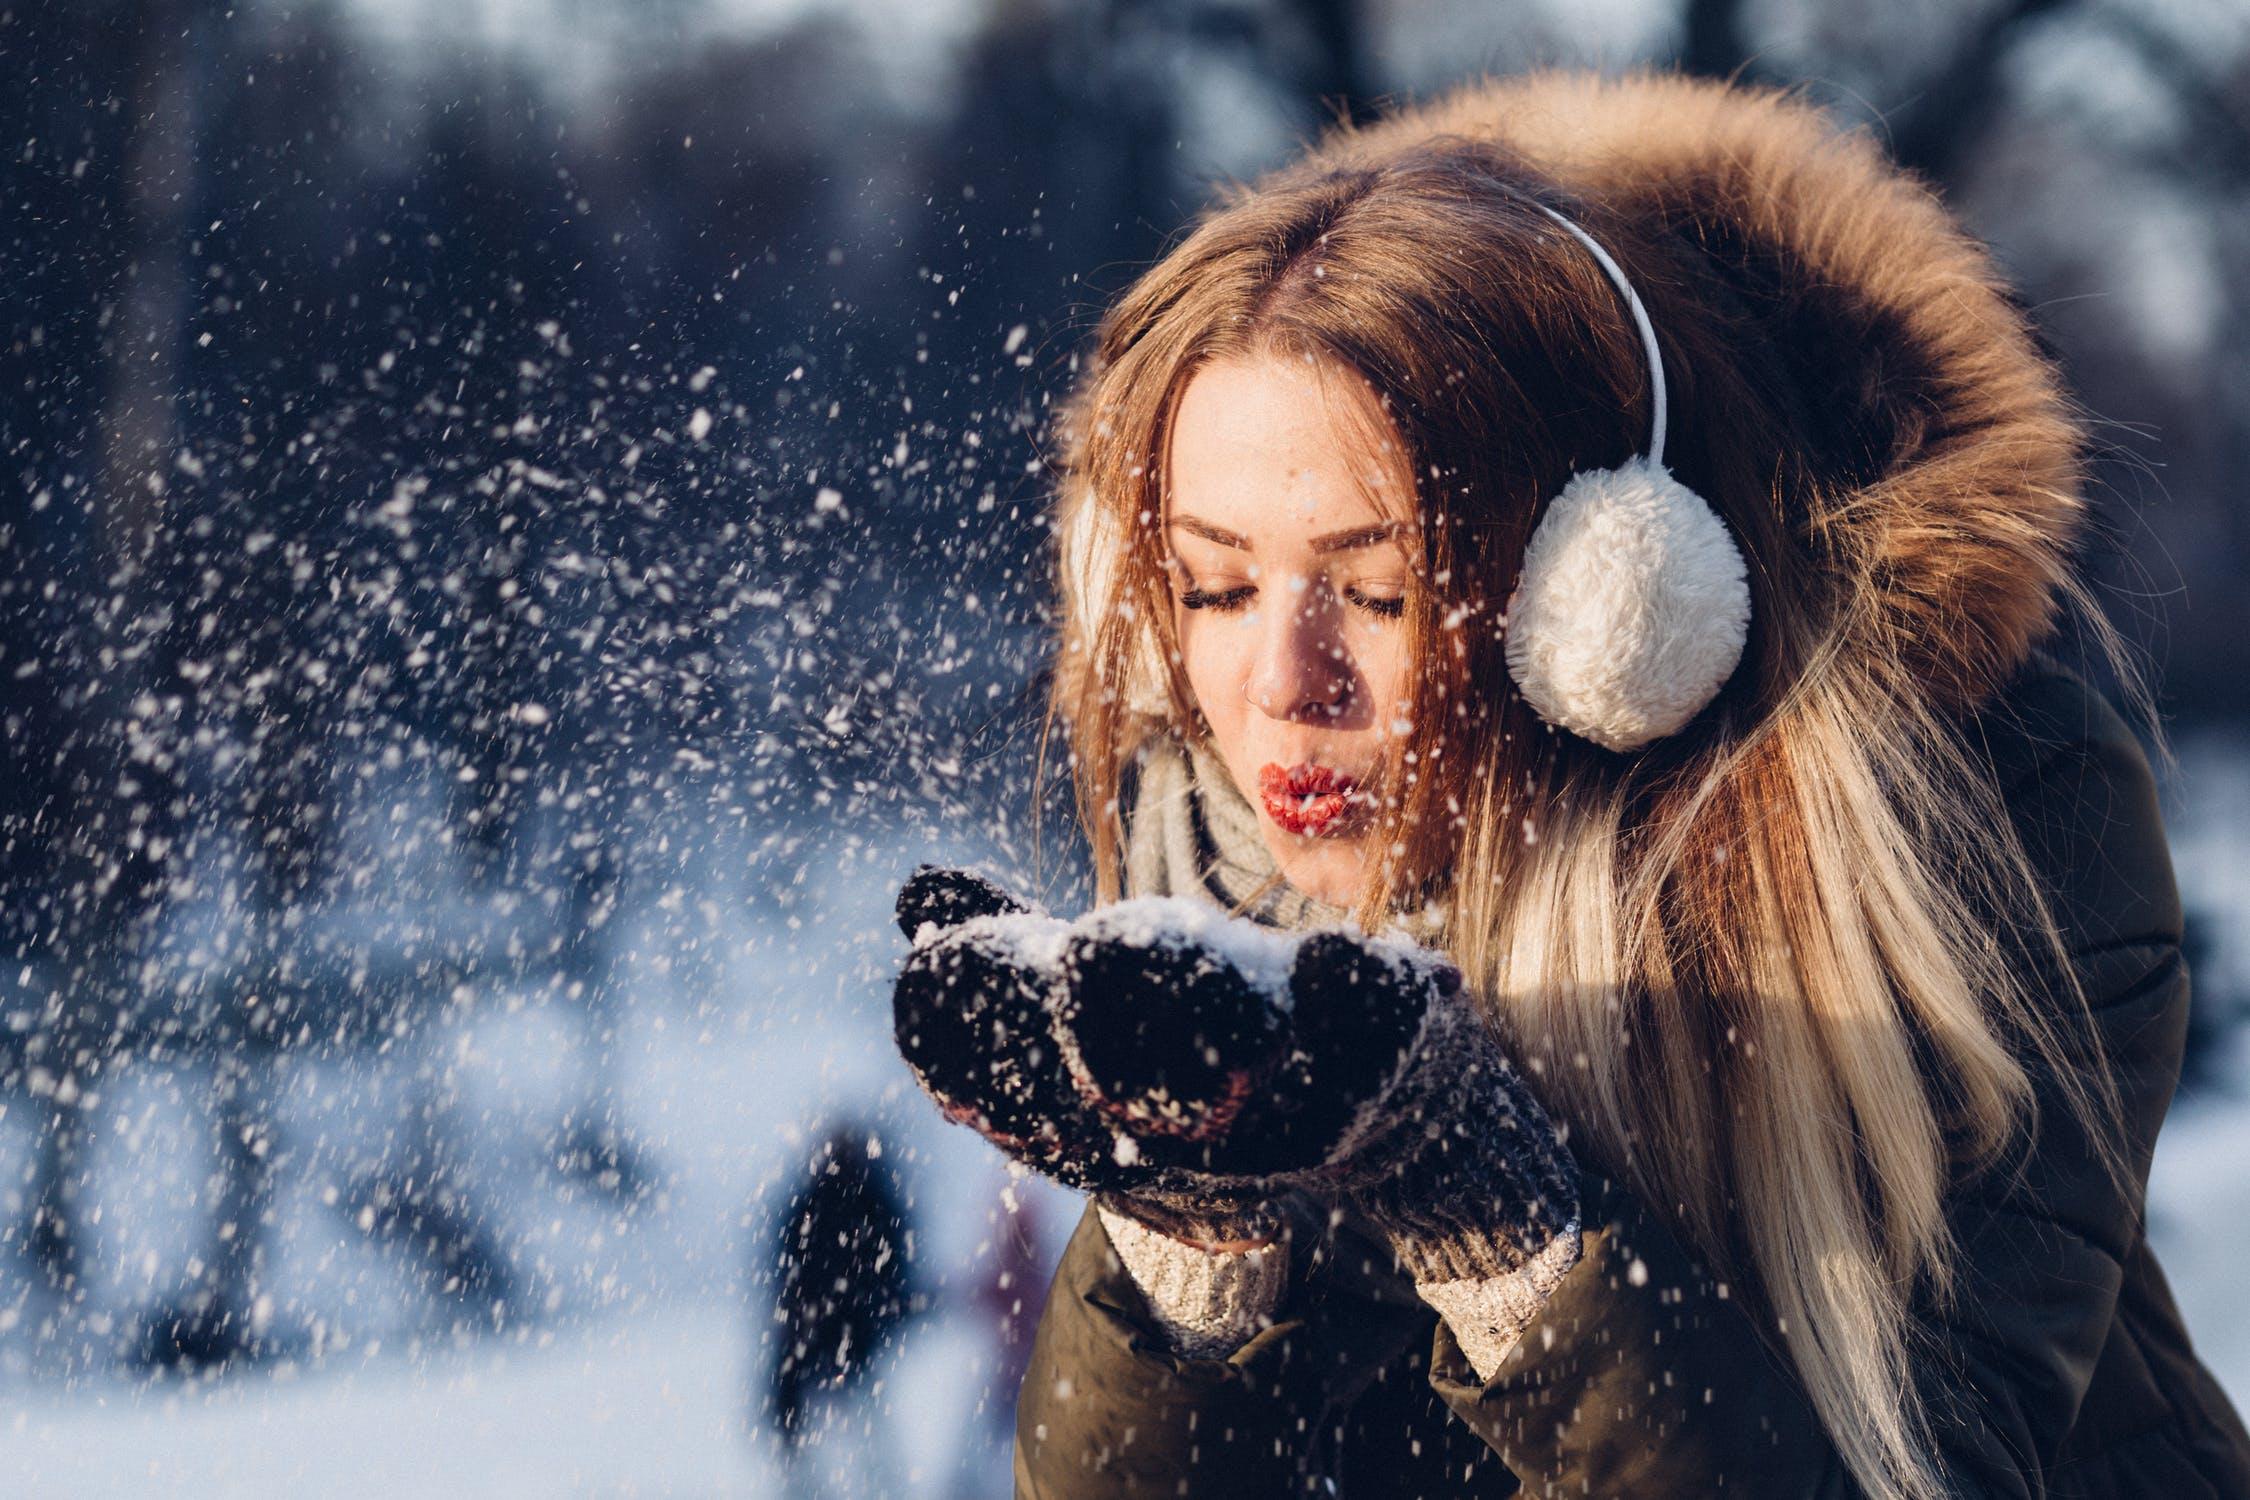 Woman blowing snow wearing earmuffs and a fur hood.